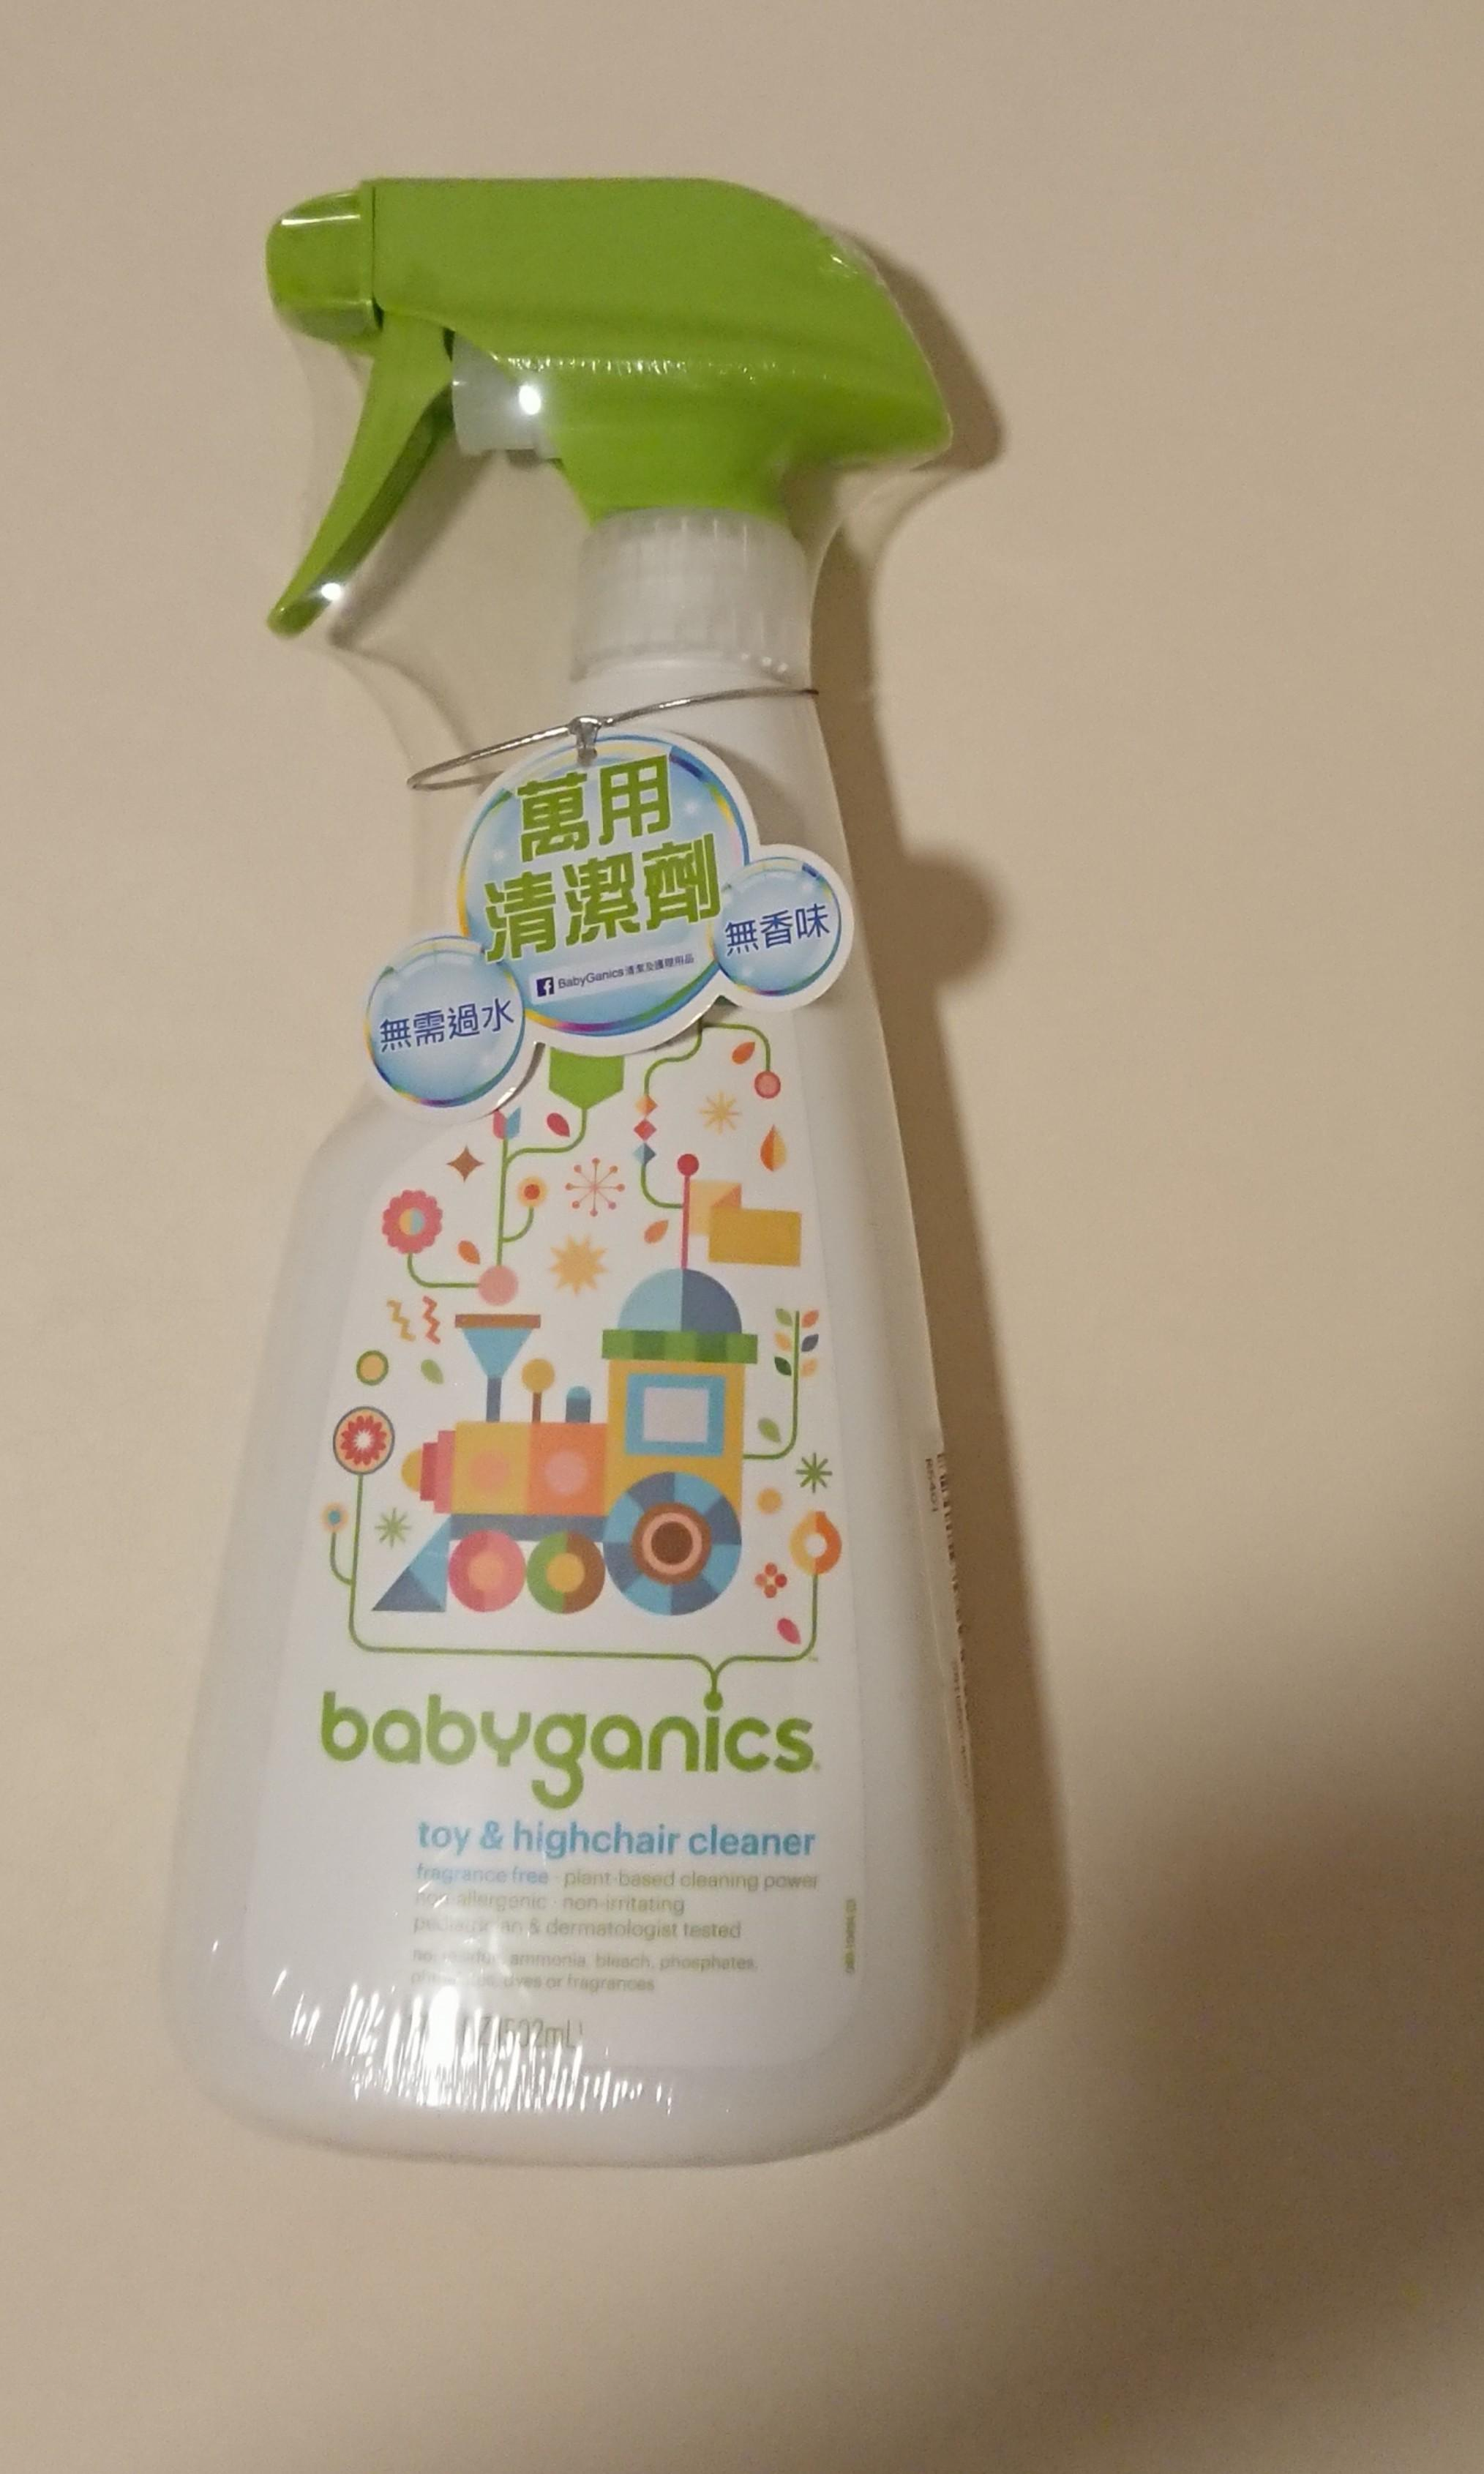 Babyganics 玩具枱椅清潔劑 全新